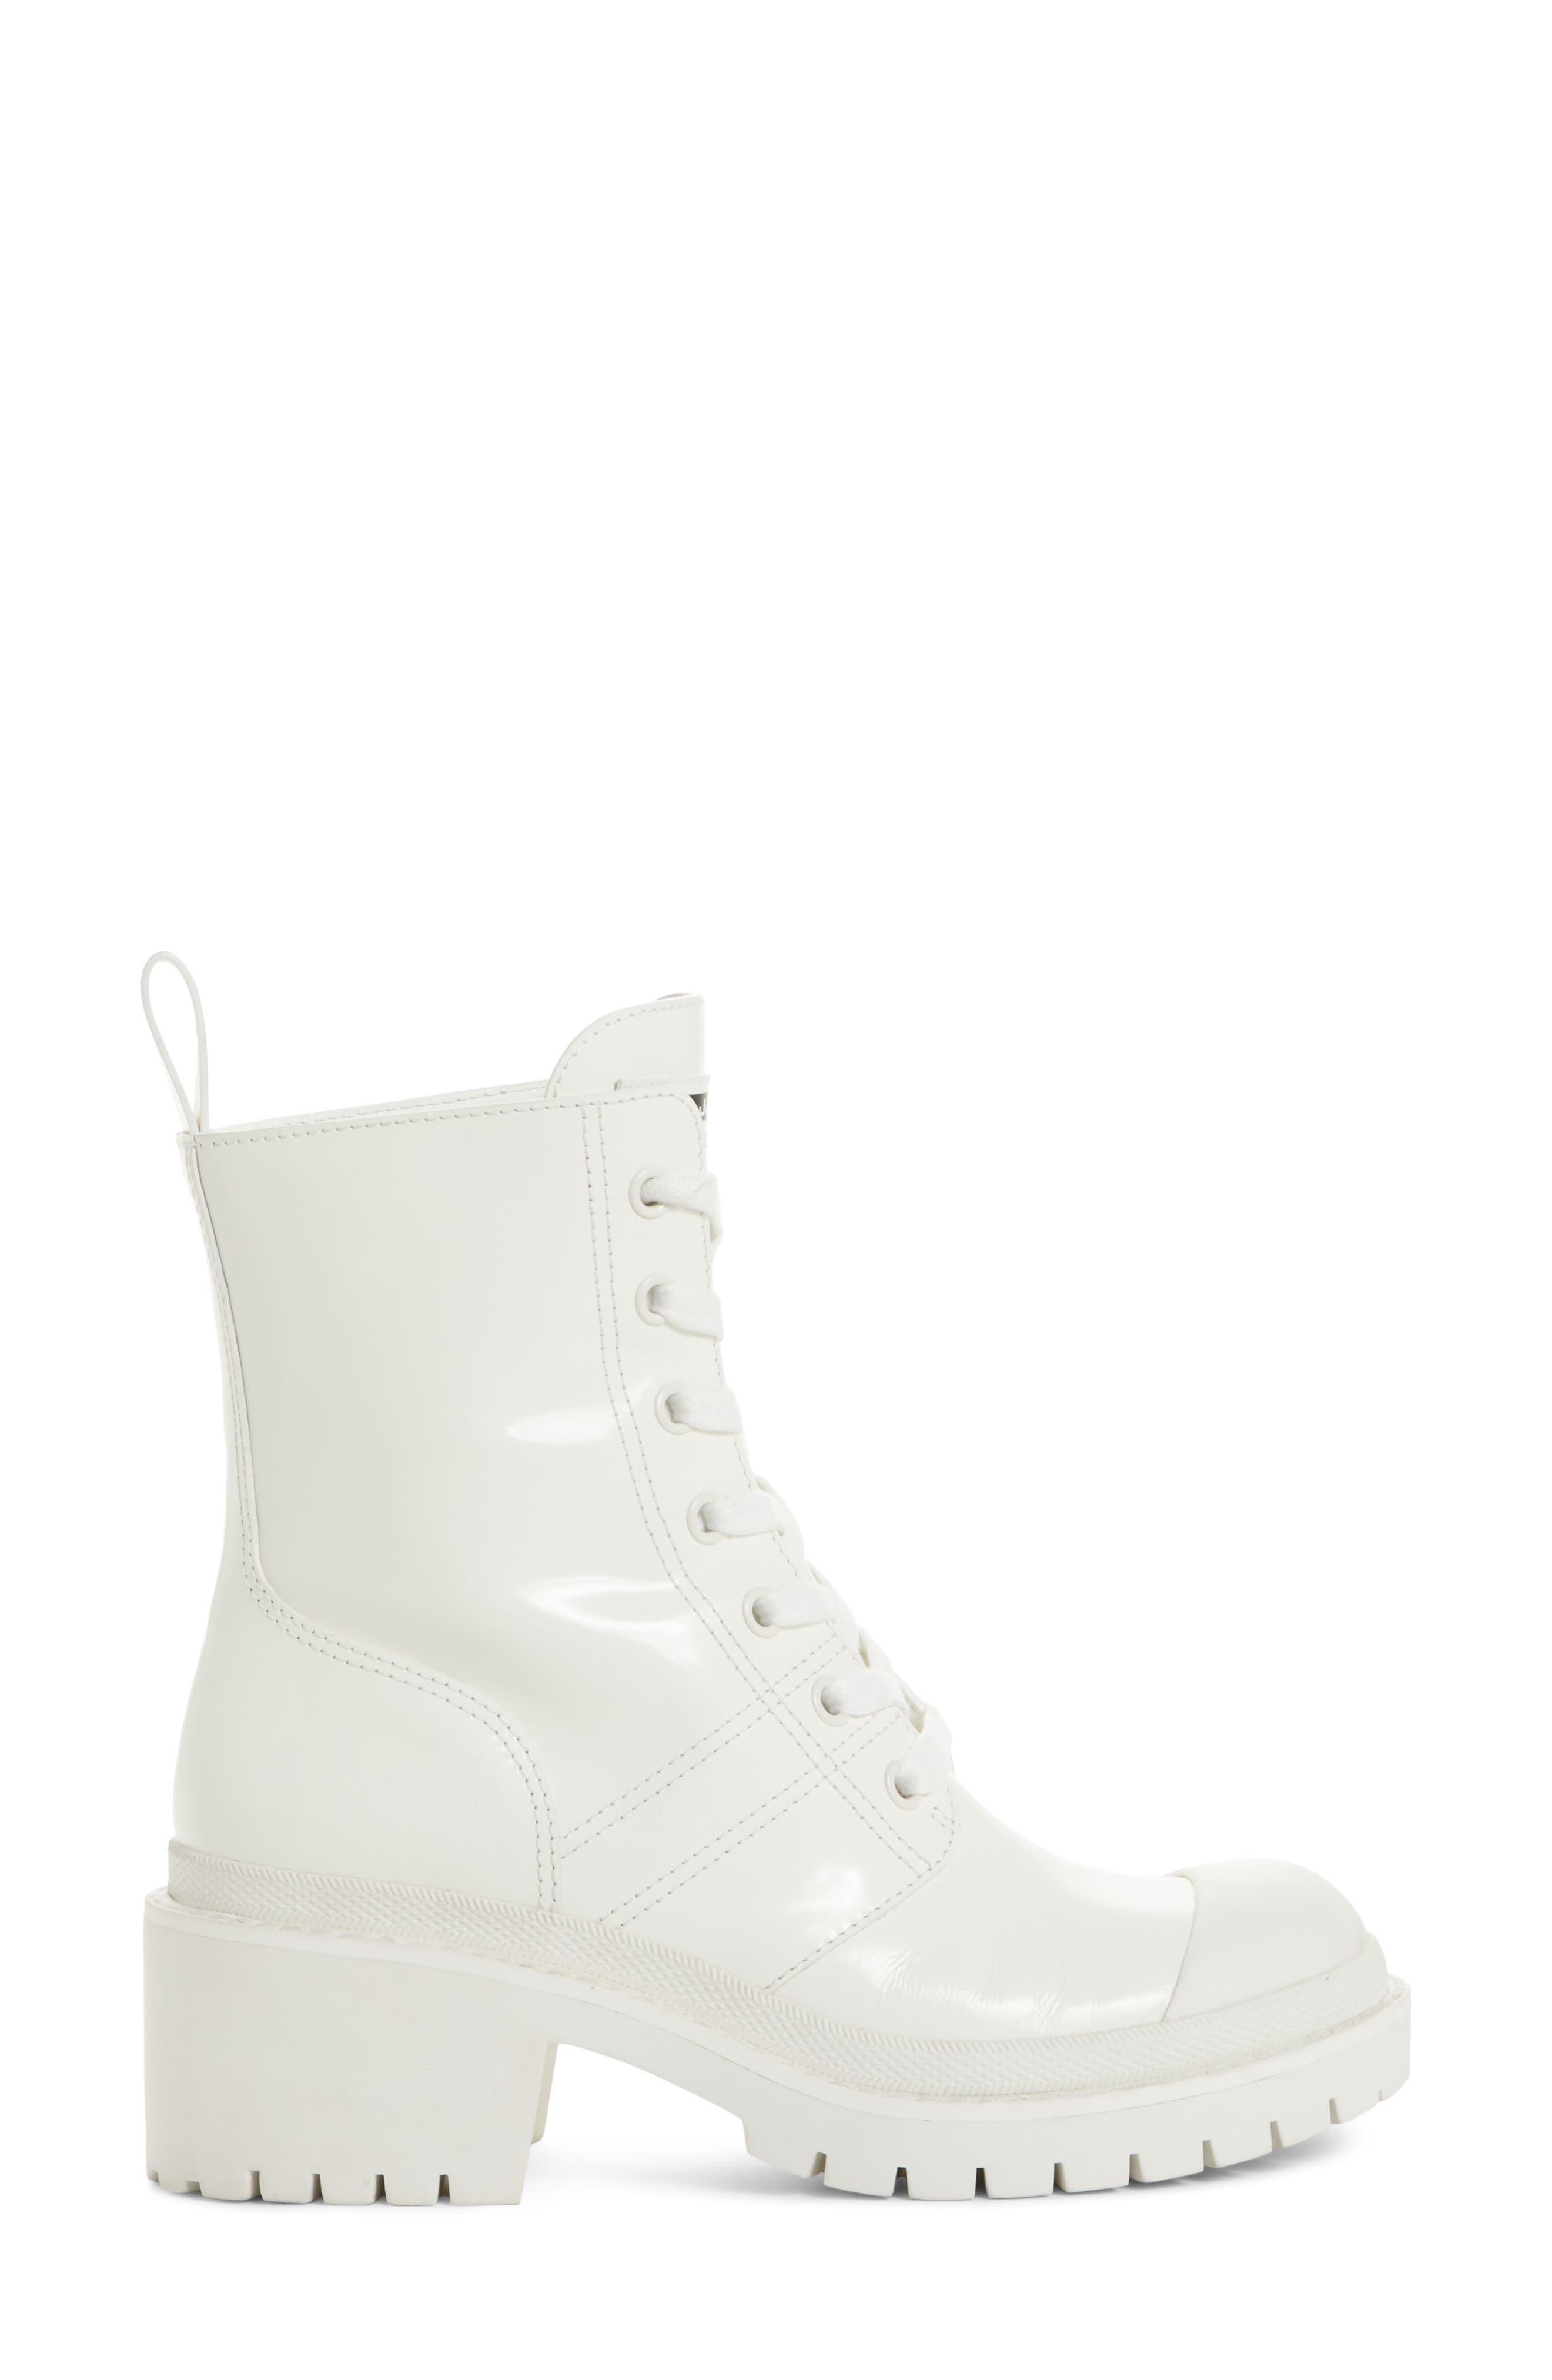 Bristol Lace-Up Boot,                             Alternate thumbnail 6, color,                             White